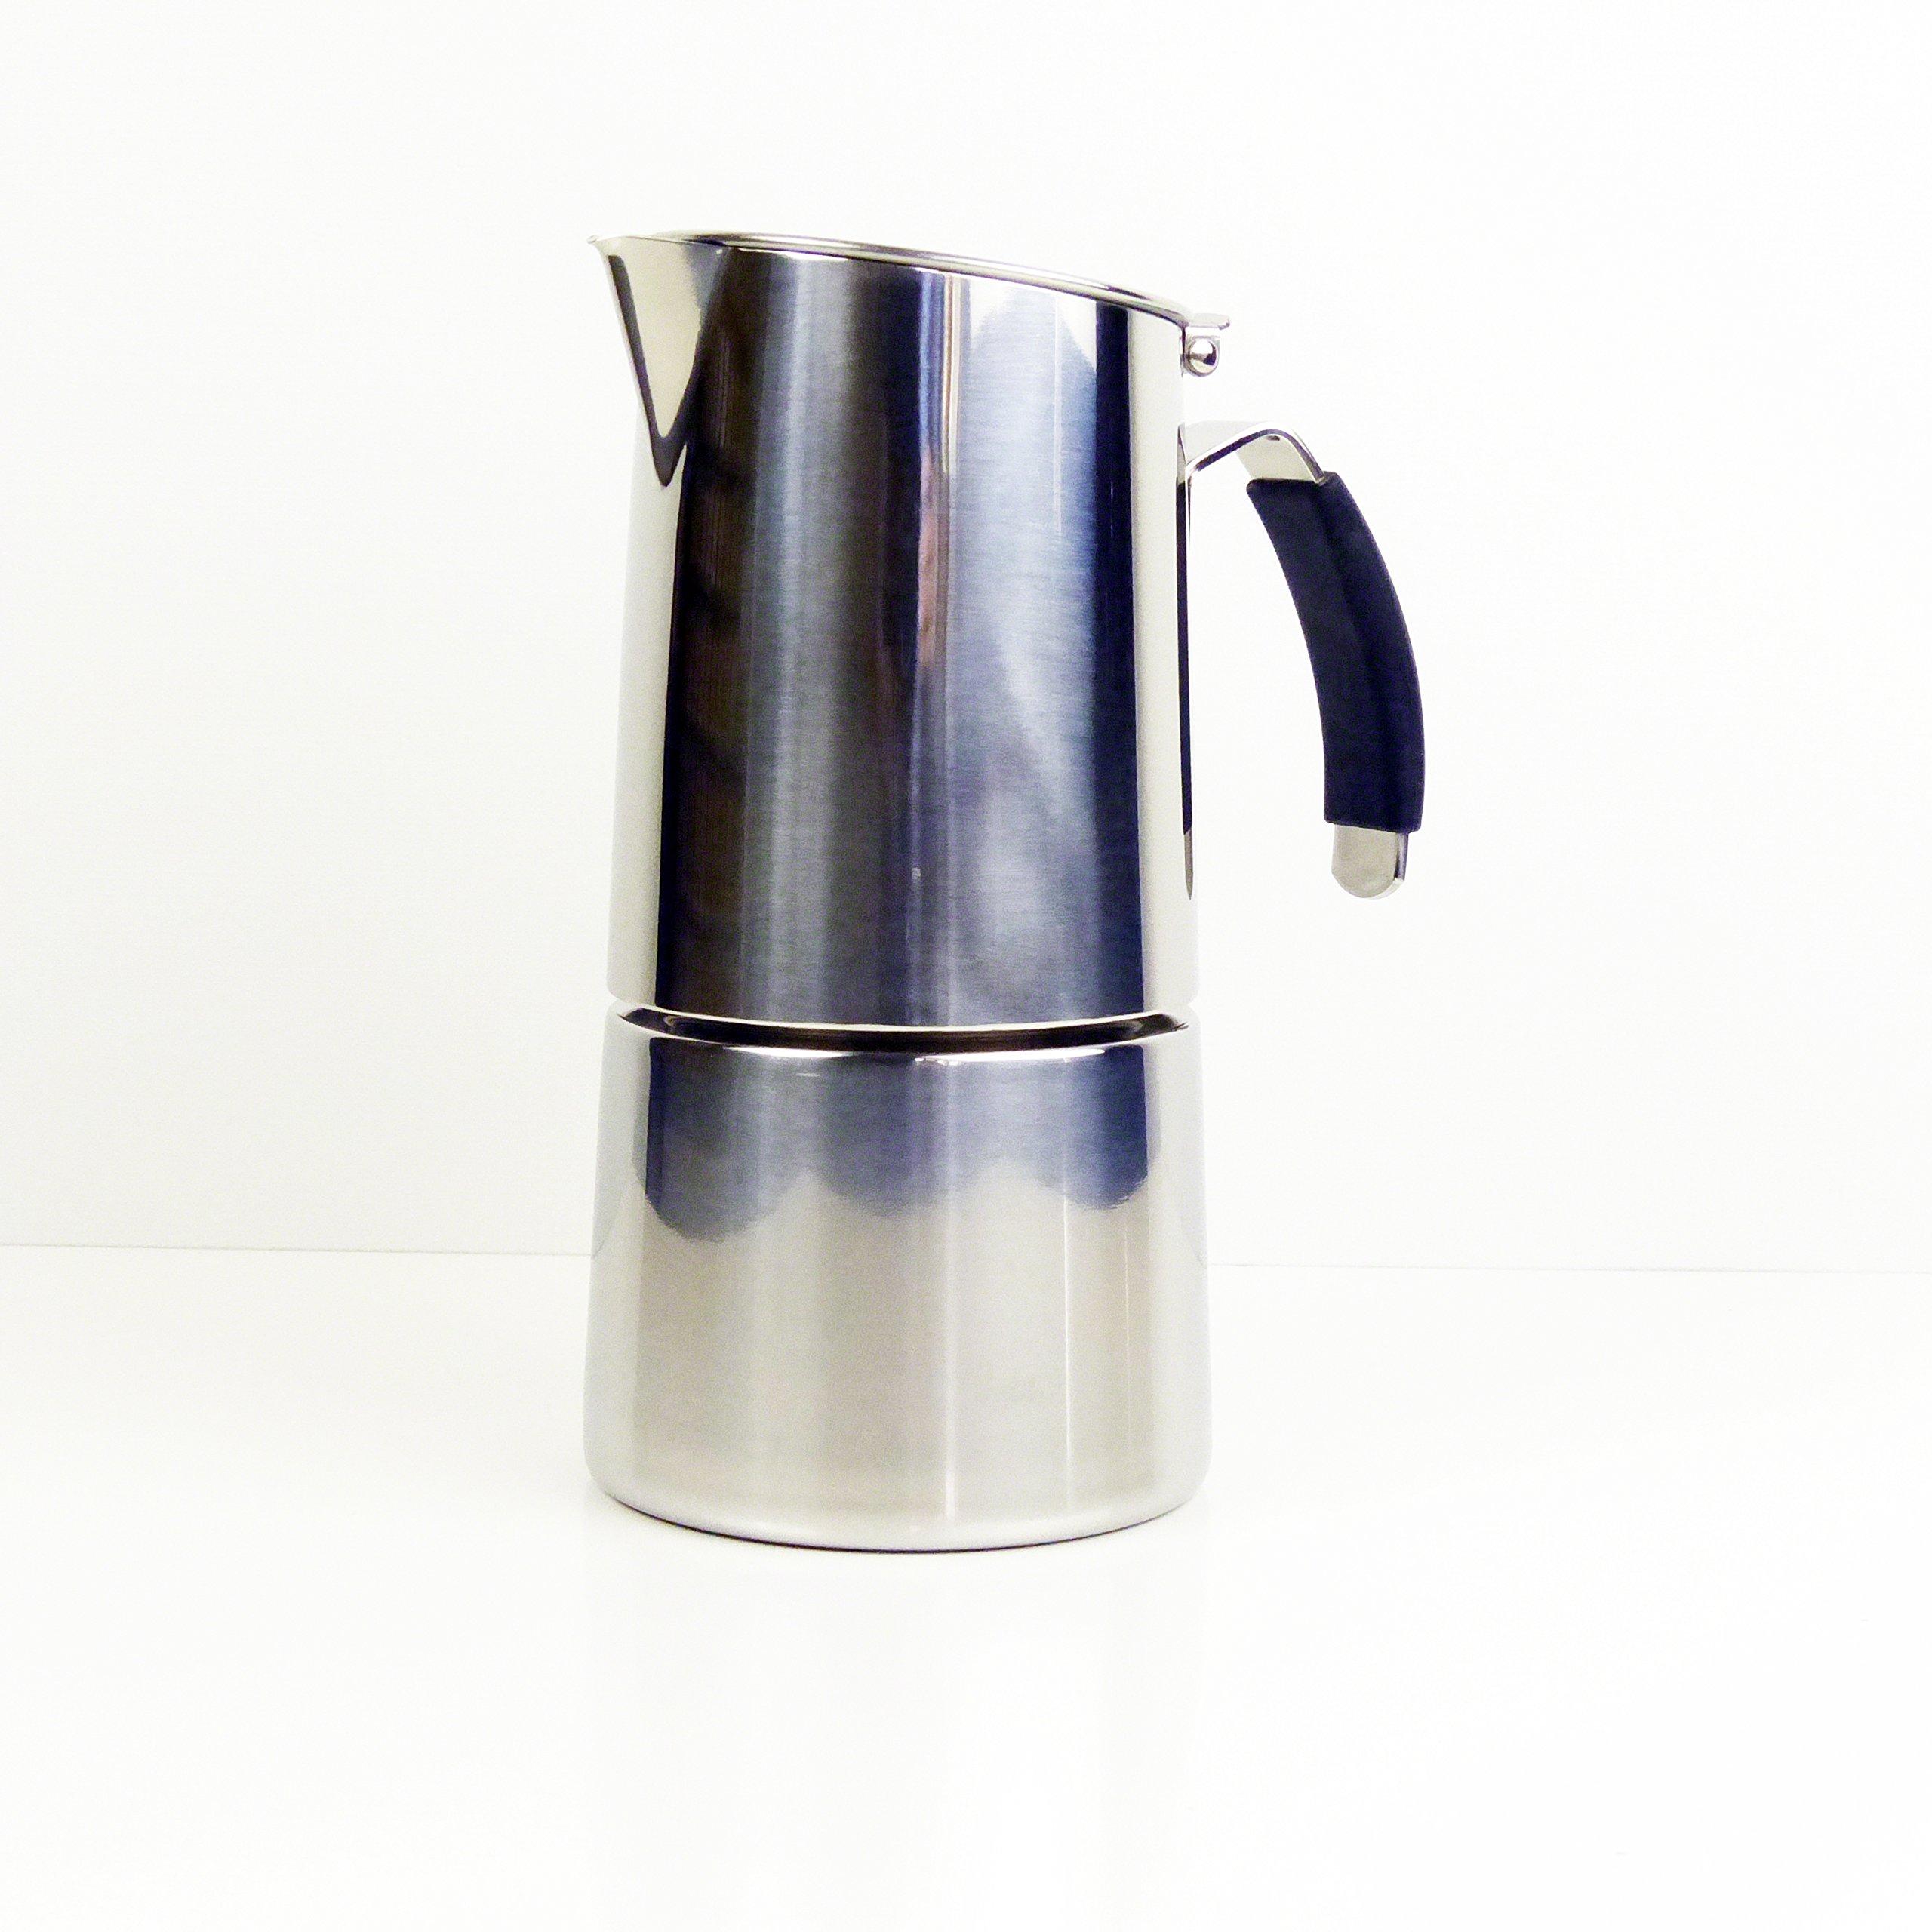 Omina by Ilsa moka espresso coffee maker (6 Italian Cups)